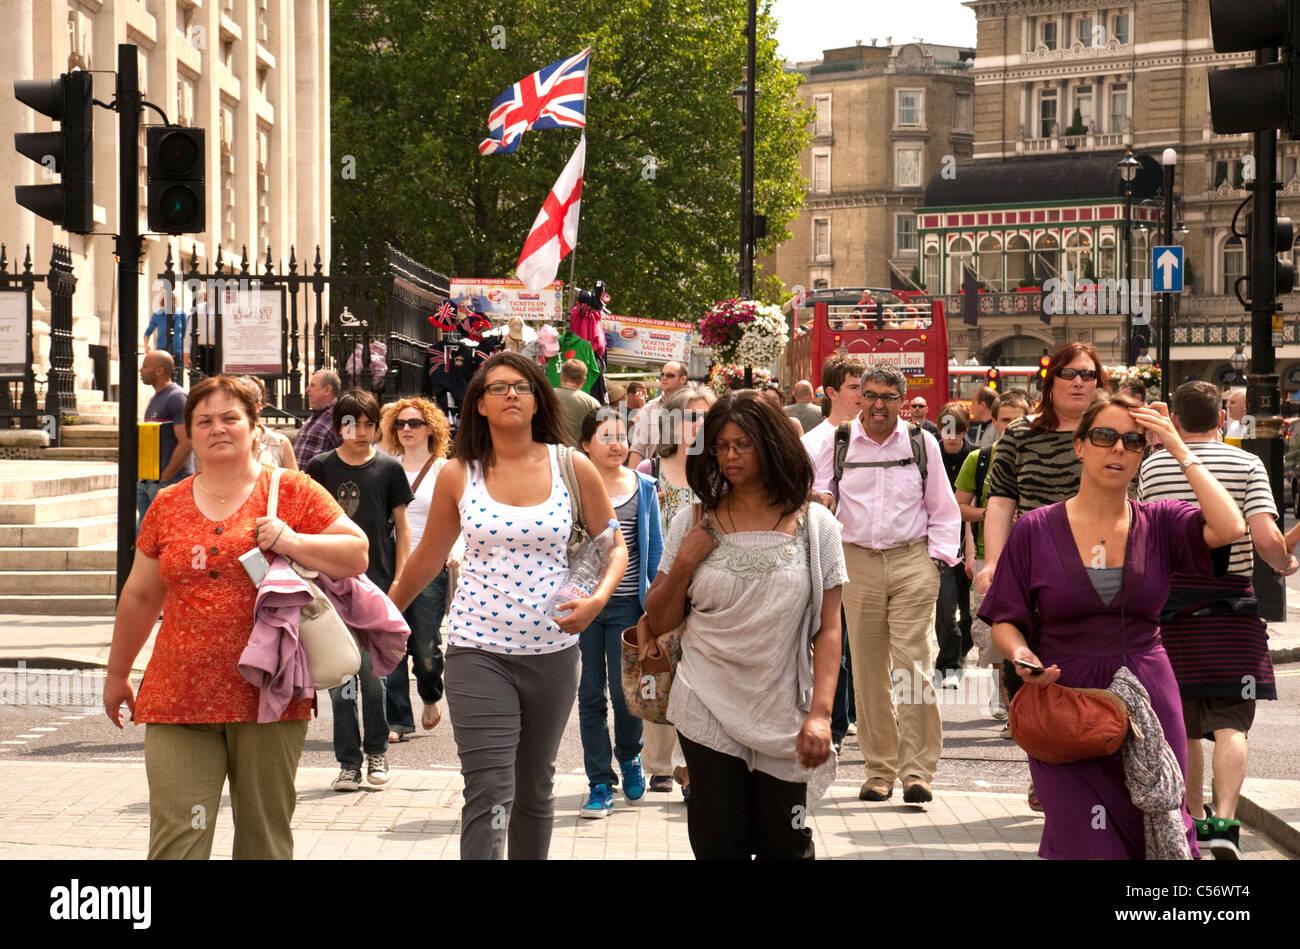 Pedestrians in Duncannon St, Central London, UK - Stock Image